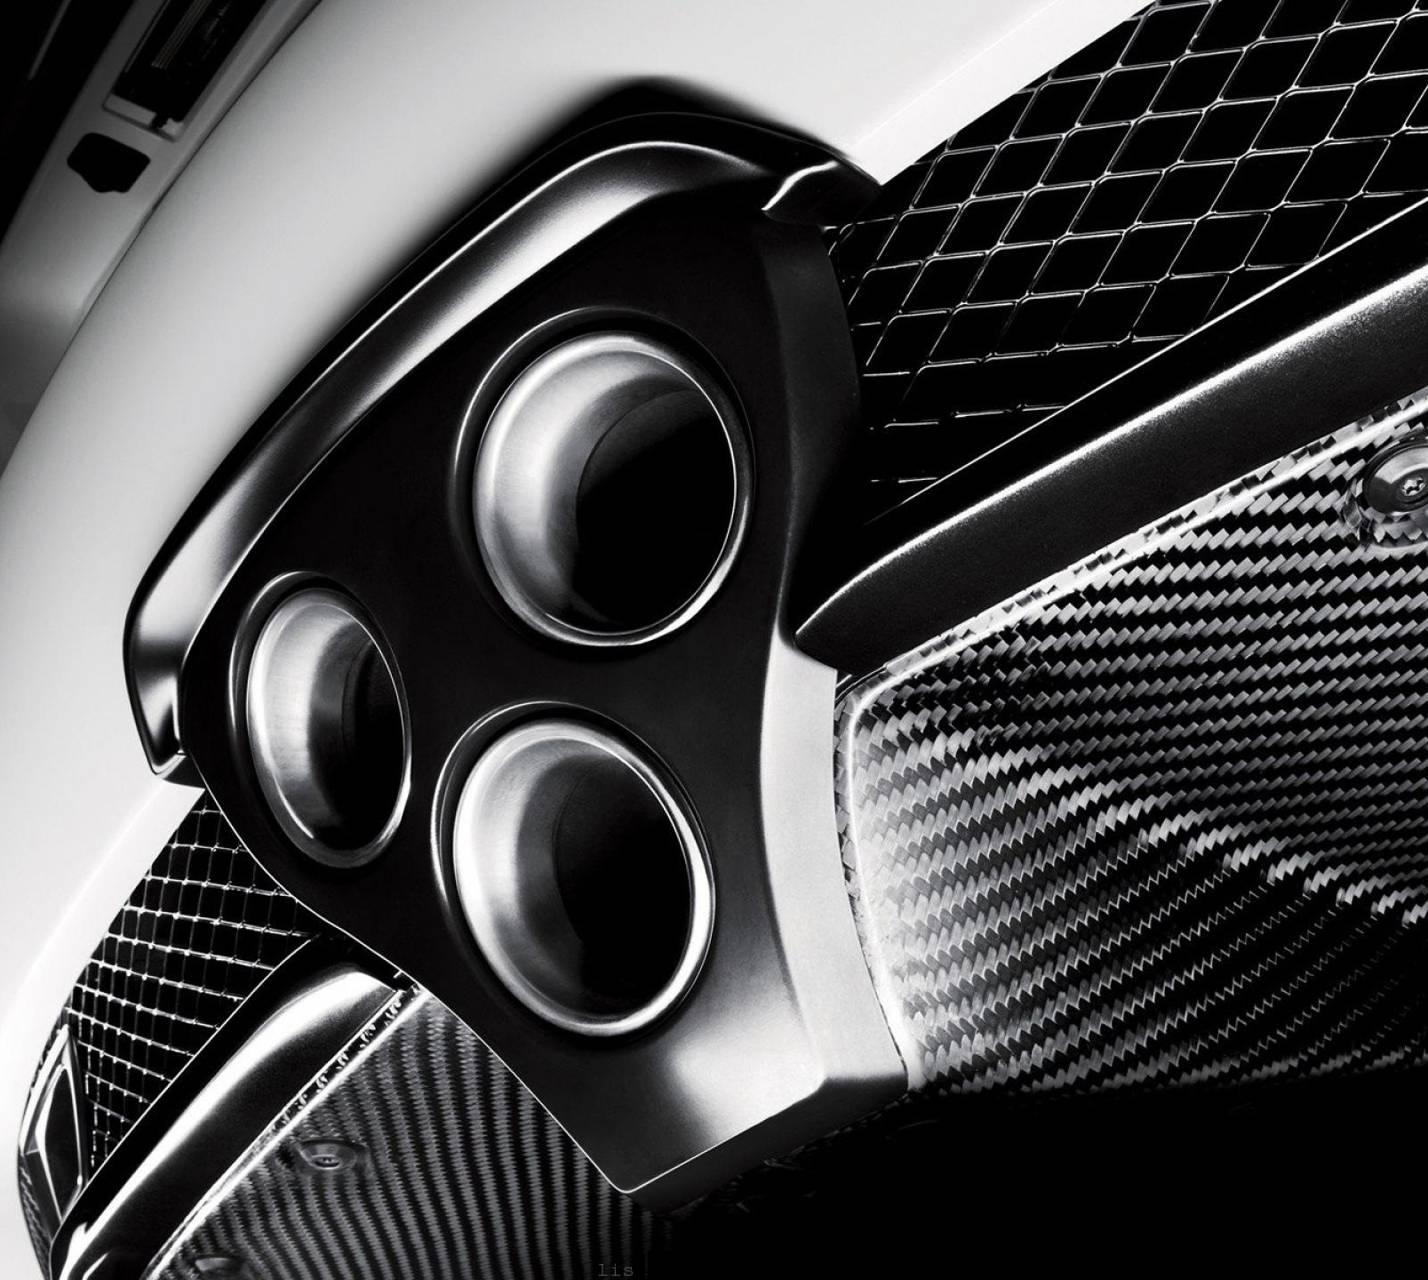 Lexus Lfa Exhaust Hd